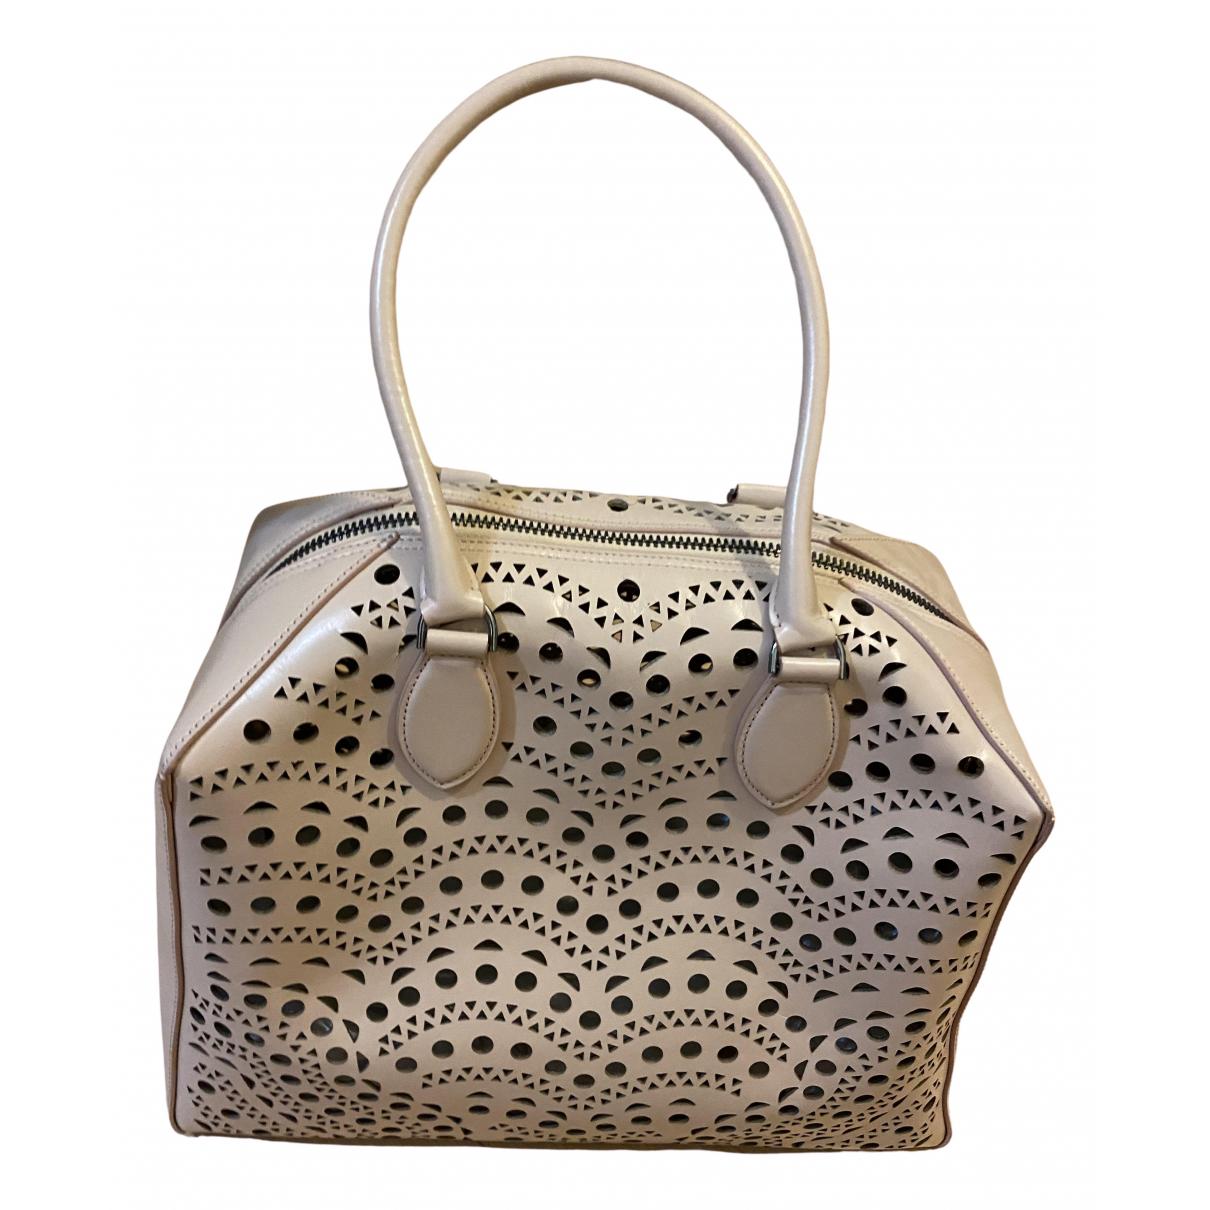 Alaïa \N Beige Leather handbag for Women \N